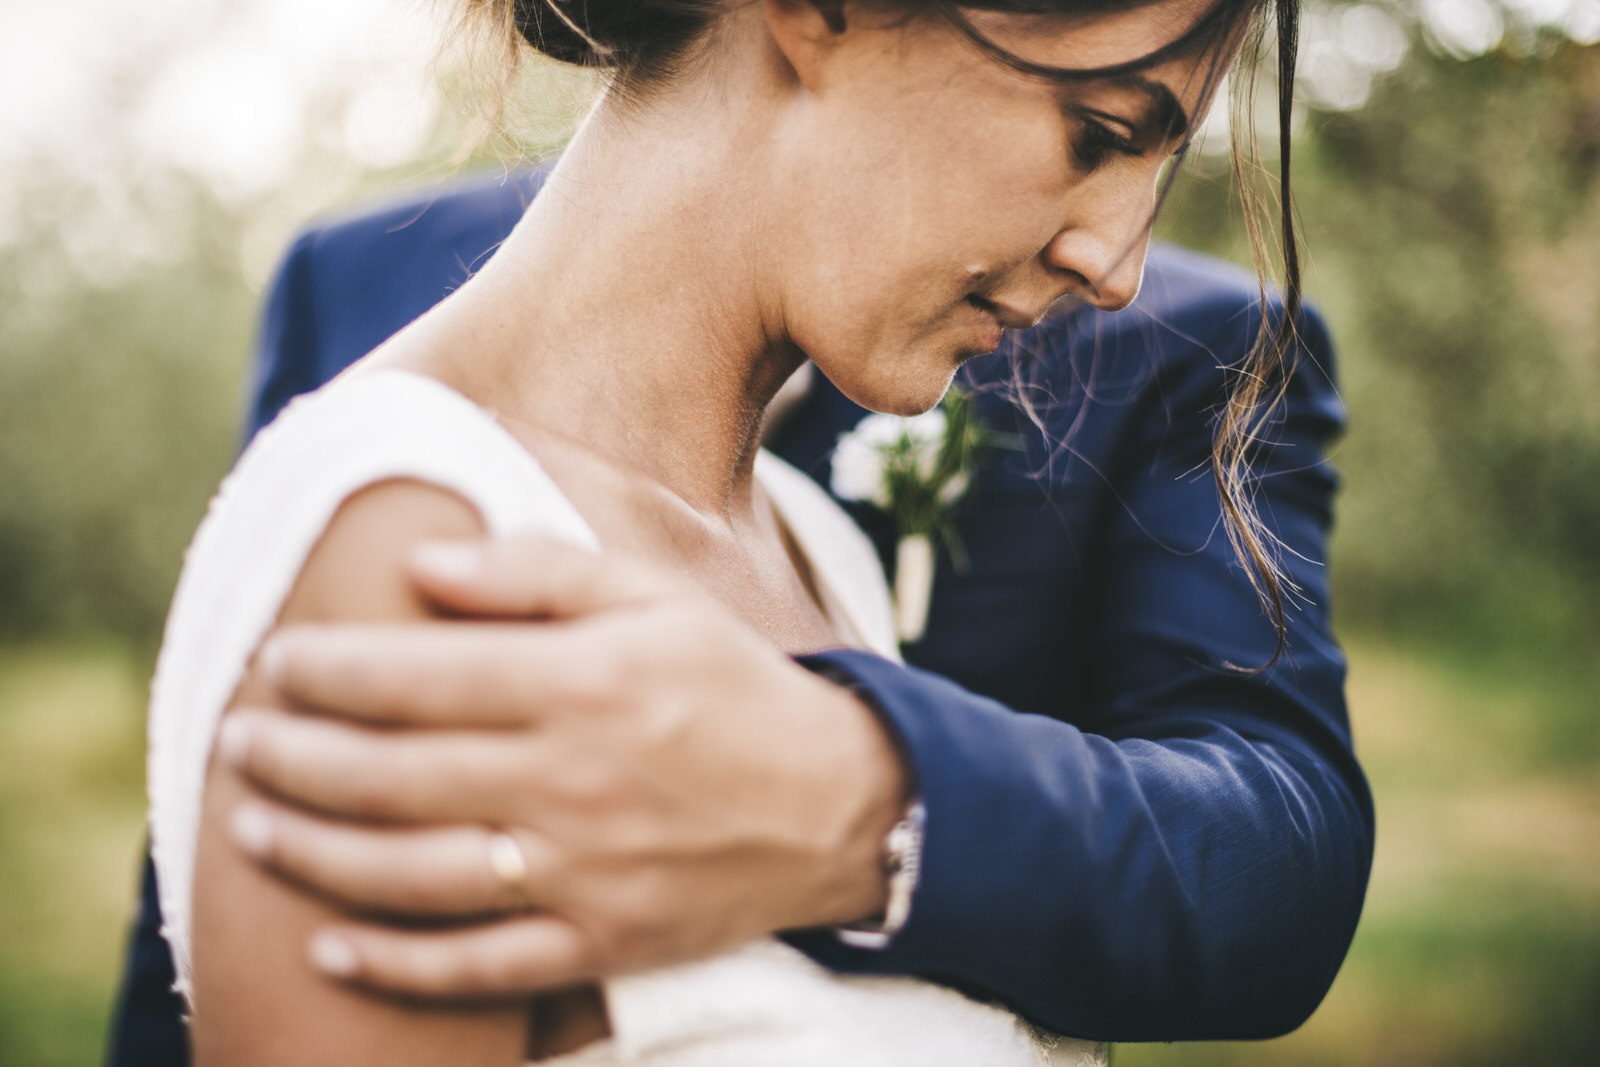 wedding photographer in italy-venice-tuscany-florence-amalfi coast-como lake-villa del balbianello-siena-amalfi-ravello-belmond-villa cimbrone23